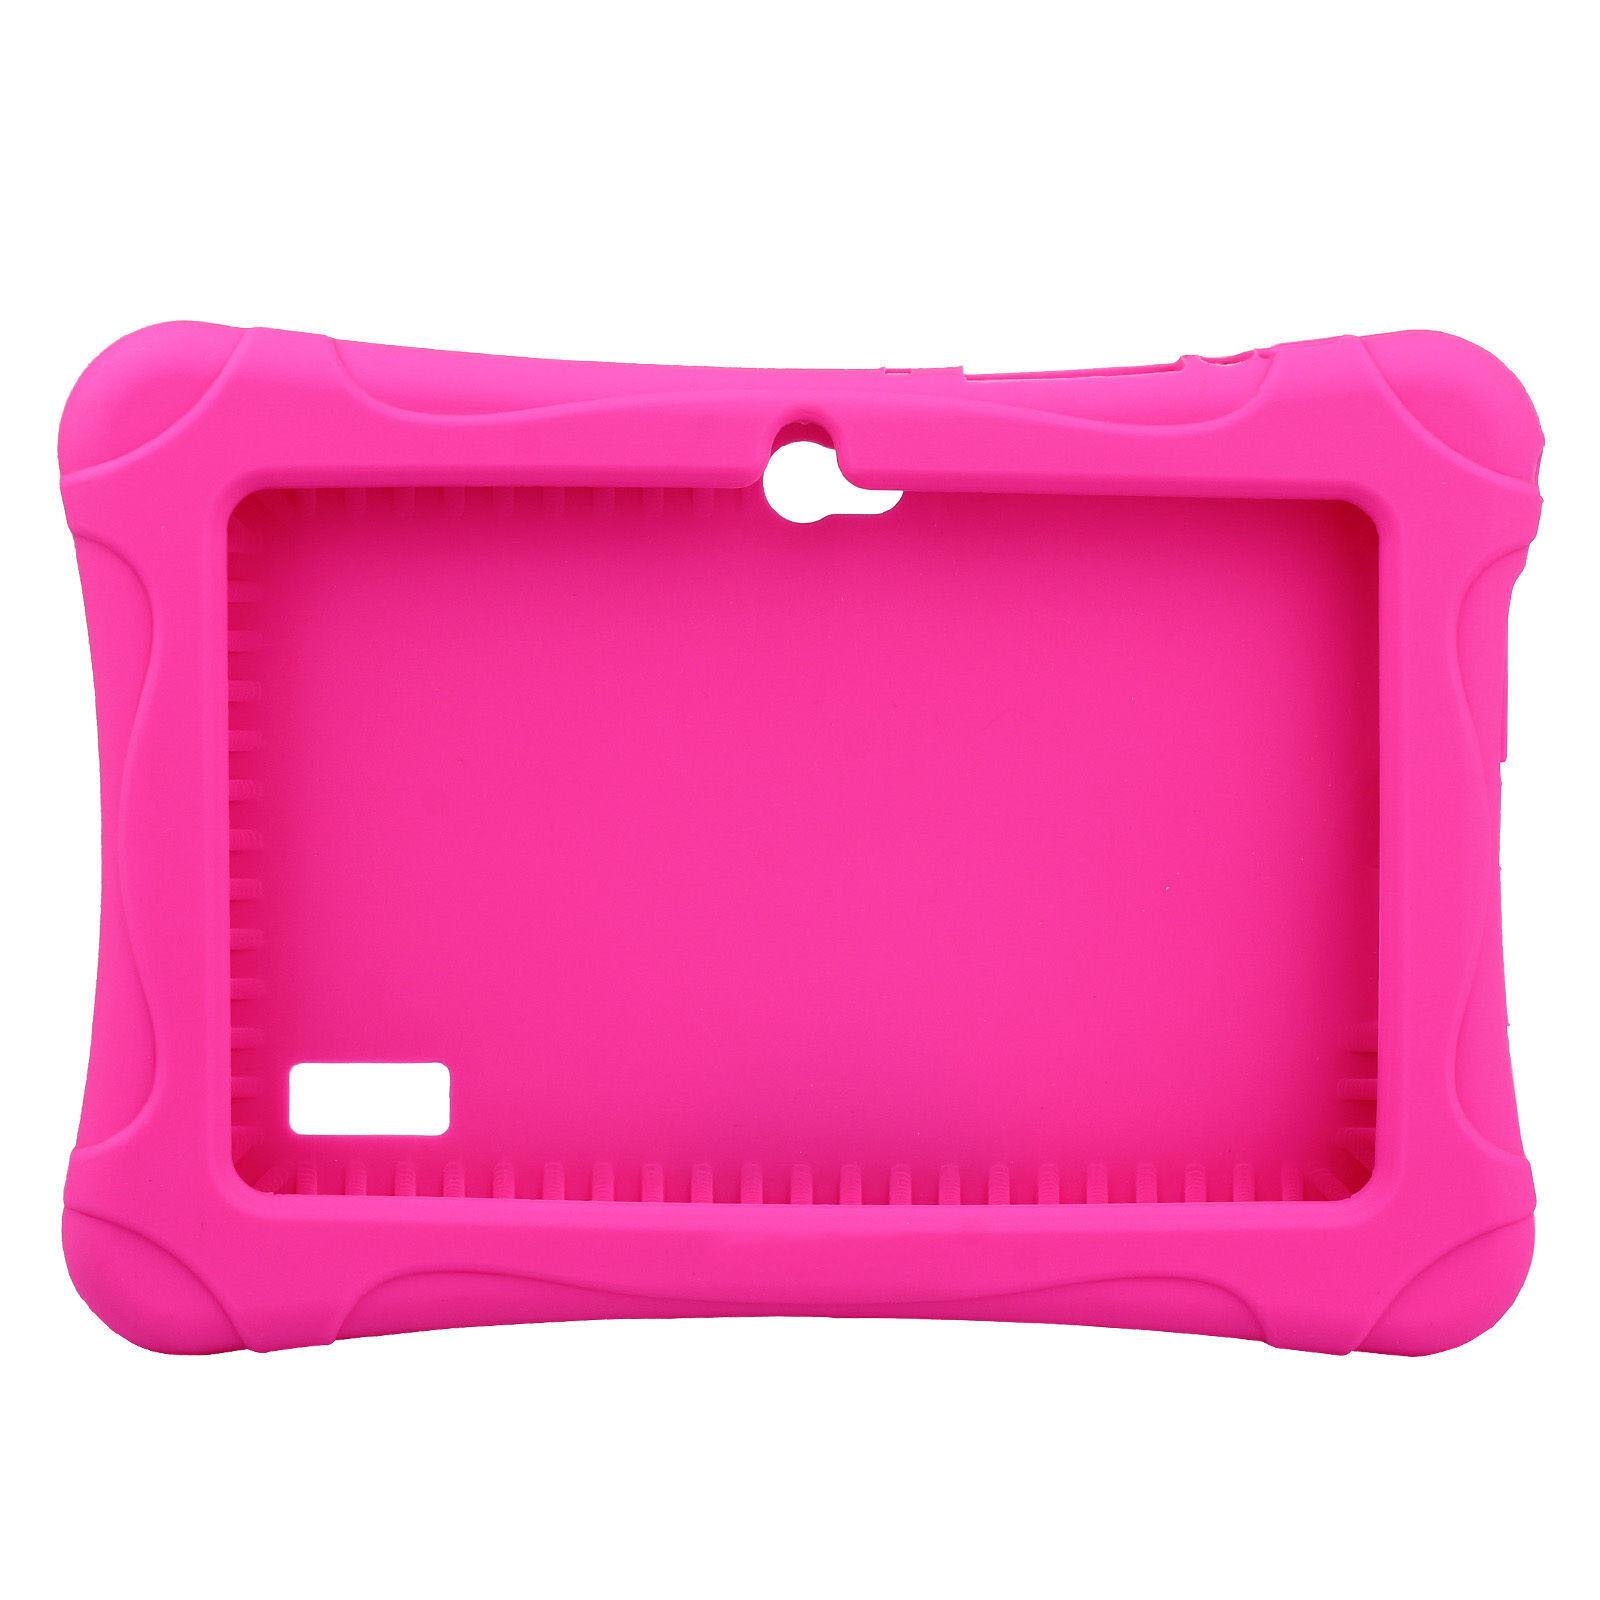 PinkcaseONLY